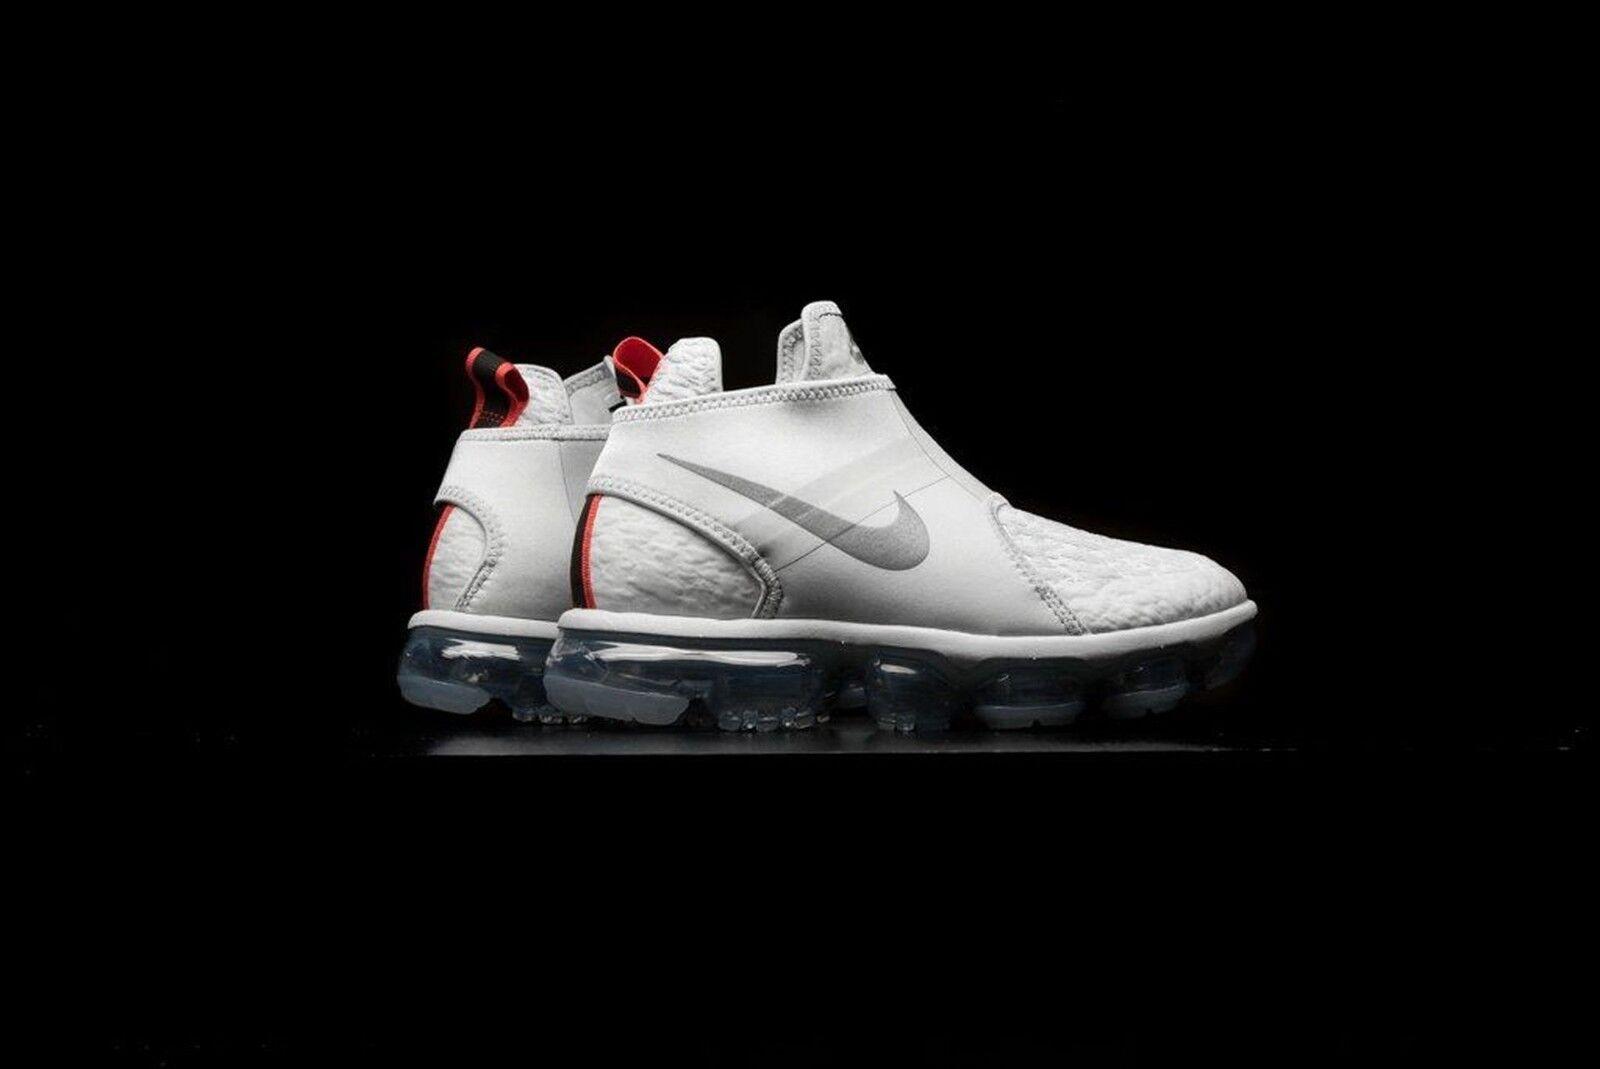 Nike Air Vapormax Chukka Slip On AO9326 Platinum 001-Pure Platinum AO9326 Mens Sz 10.5 851d43